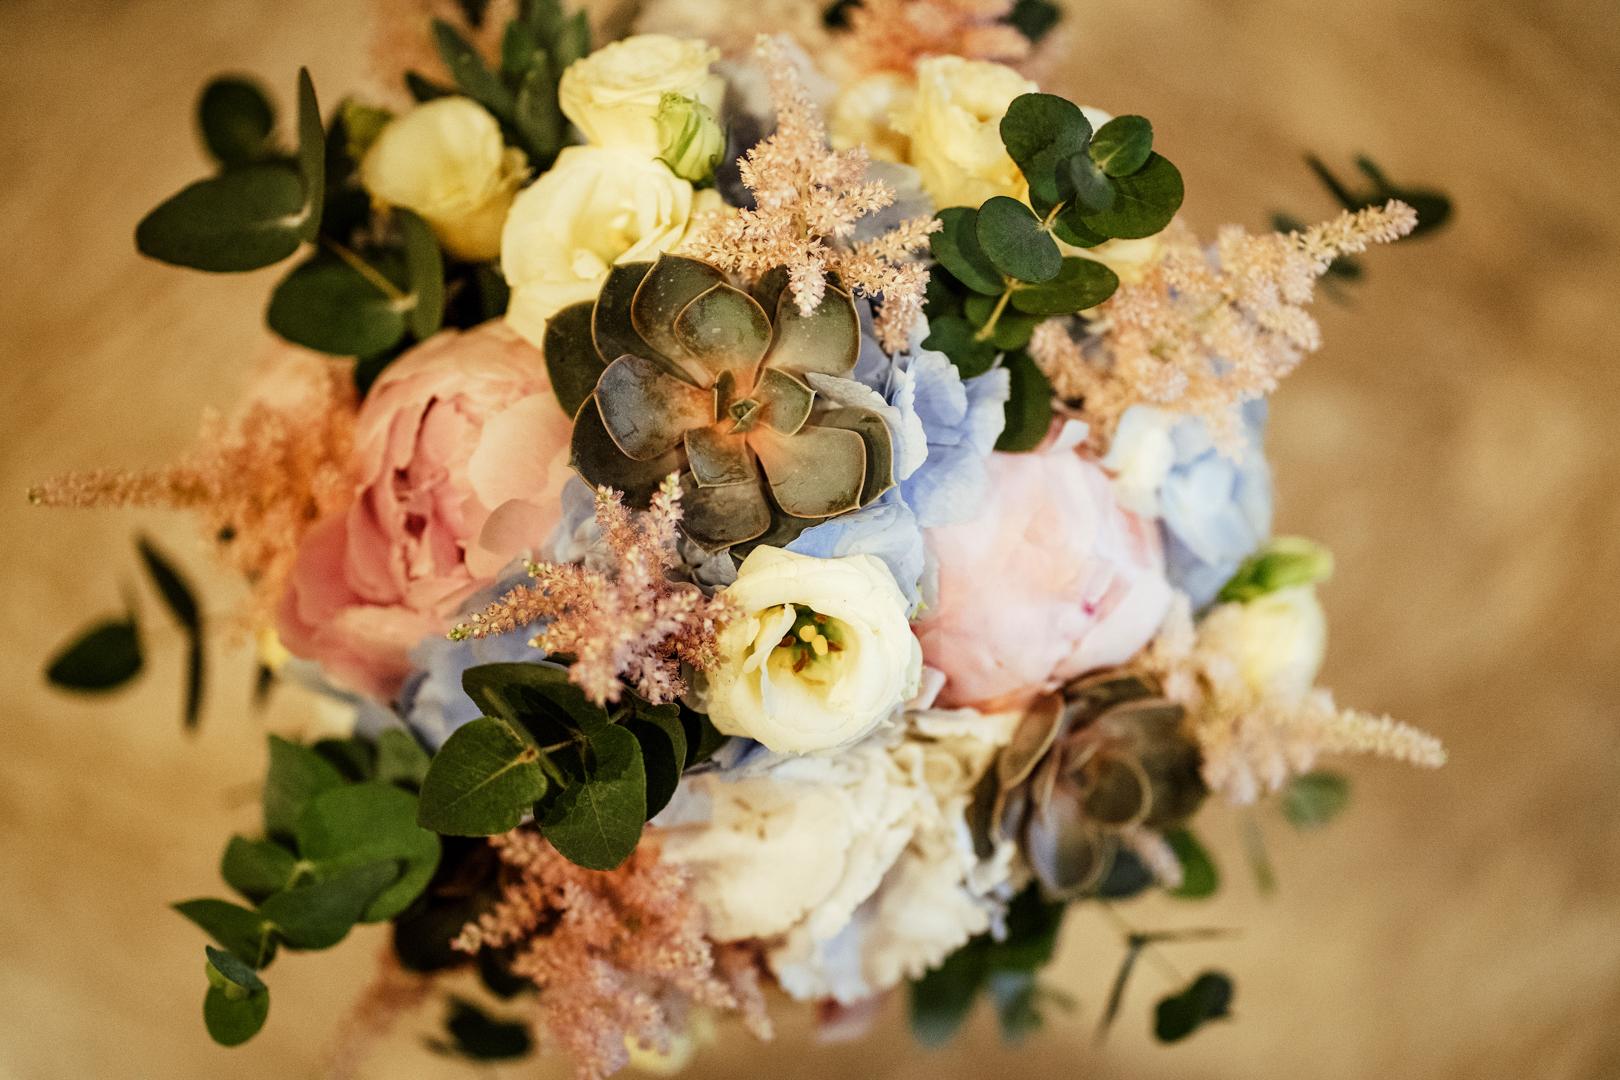 3 gianni-lepore-bouquet-sposa